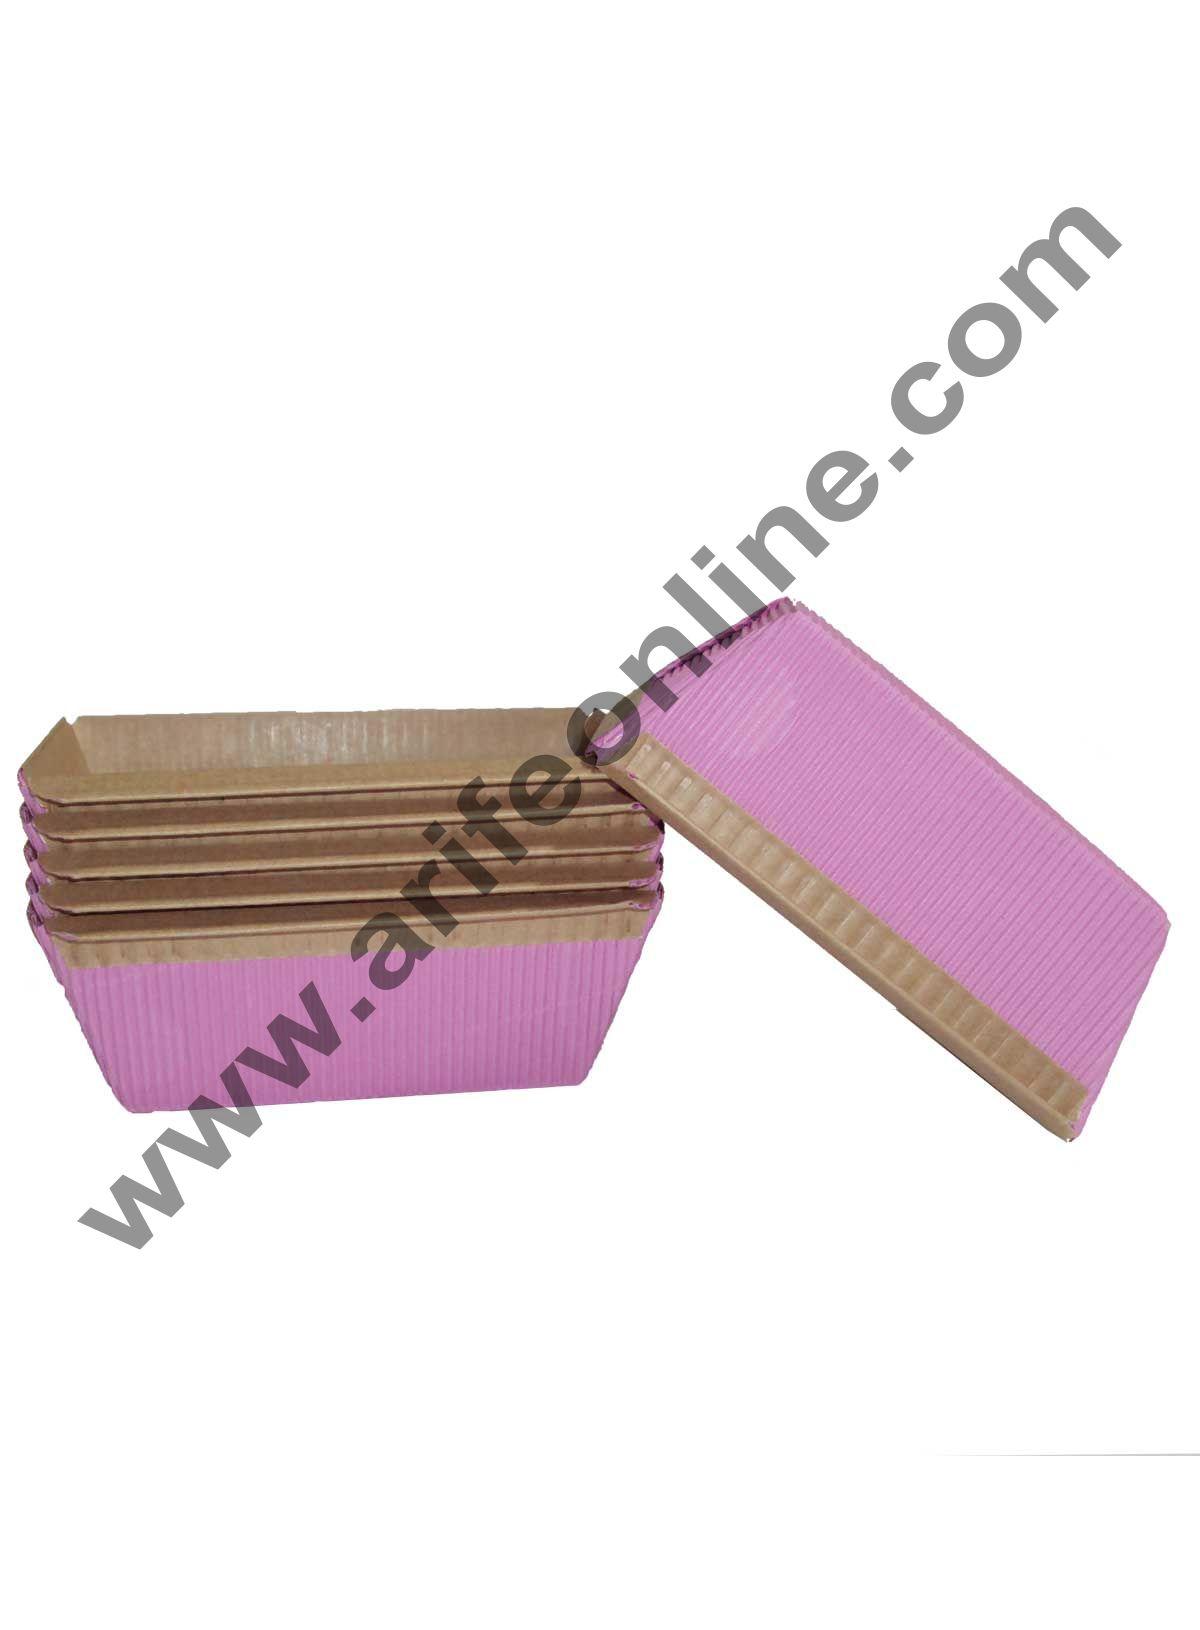 Novacart Bake & Serve Paper Baking Mould By Cake Decor - Plum Cake Mould Pink 10 Pcs